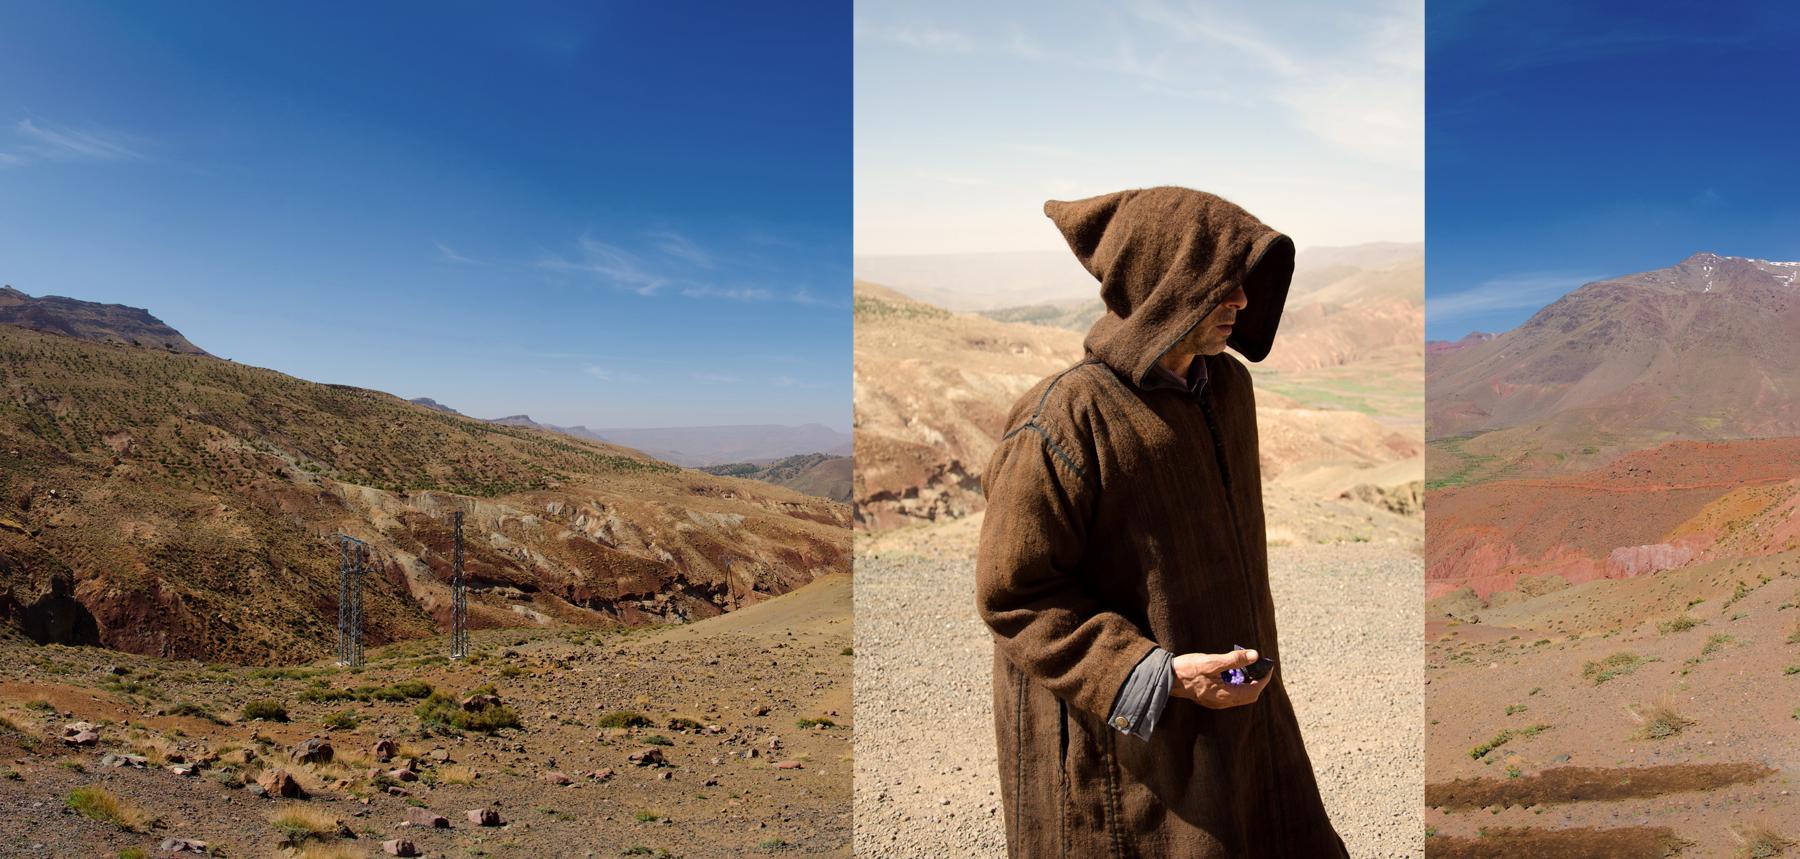 Berber Peddler, Atlas Mountains, Morocco. 2016 - © Mike Best